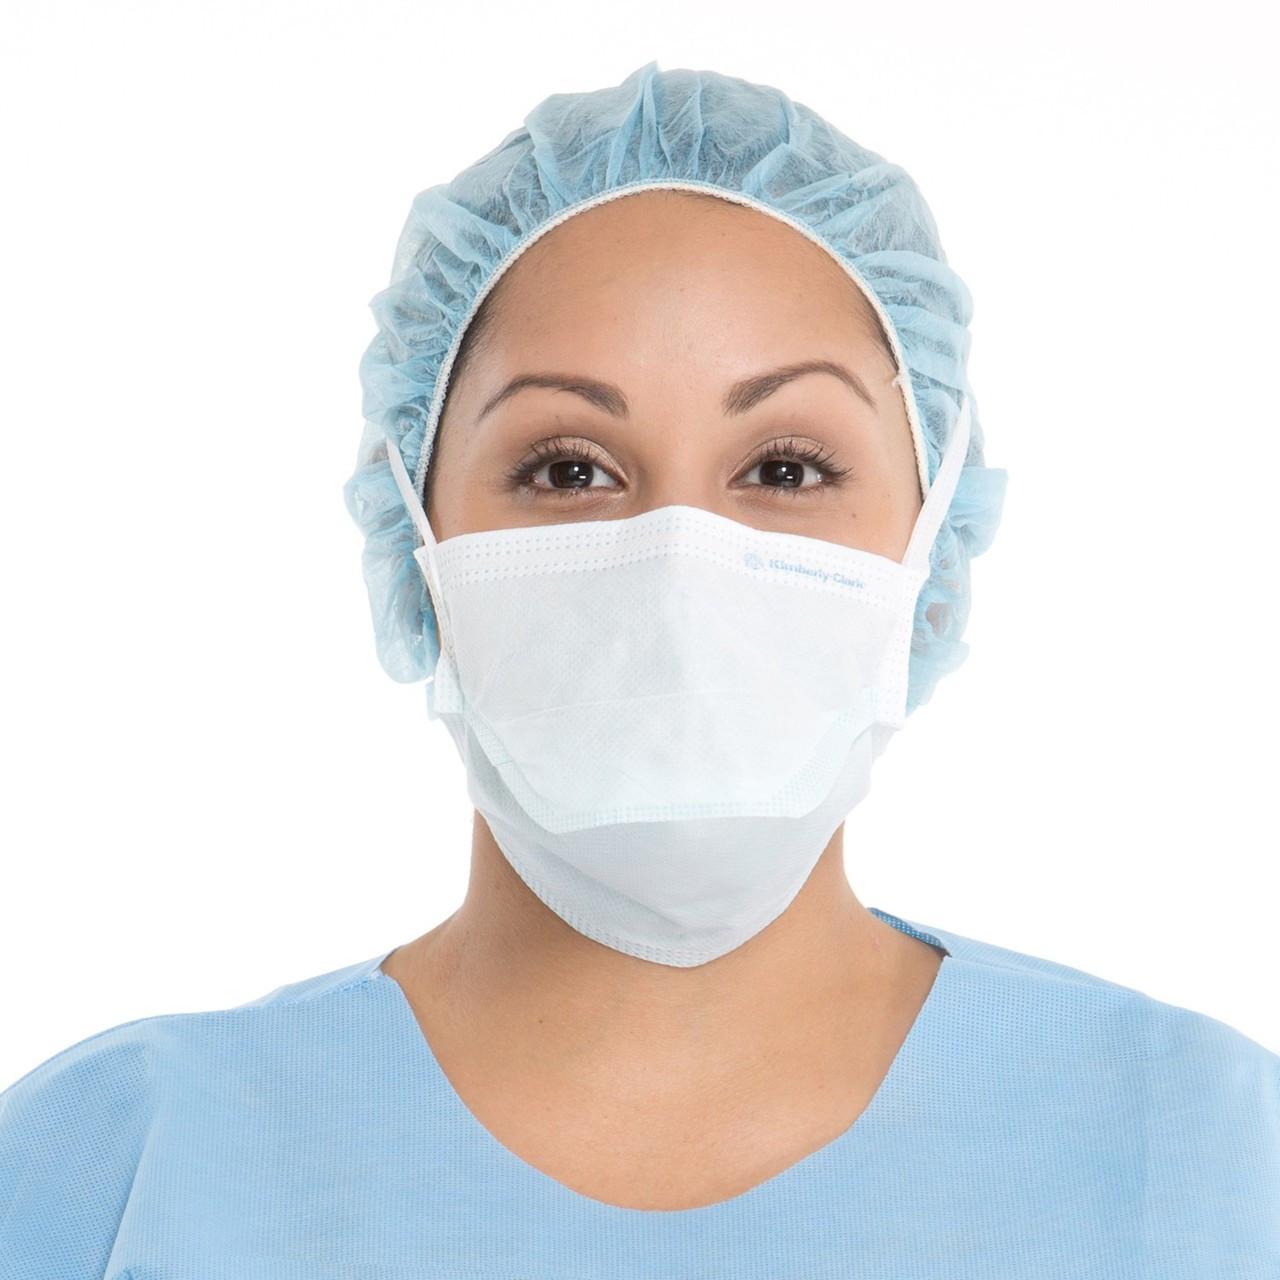 Duckbill Surgical Mask | USAMedicalSurgical.com